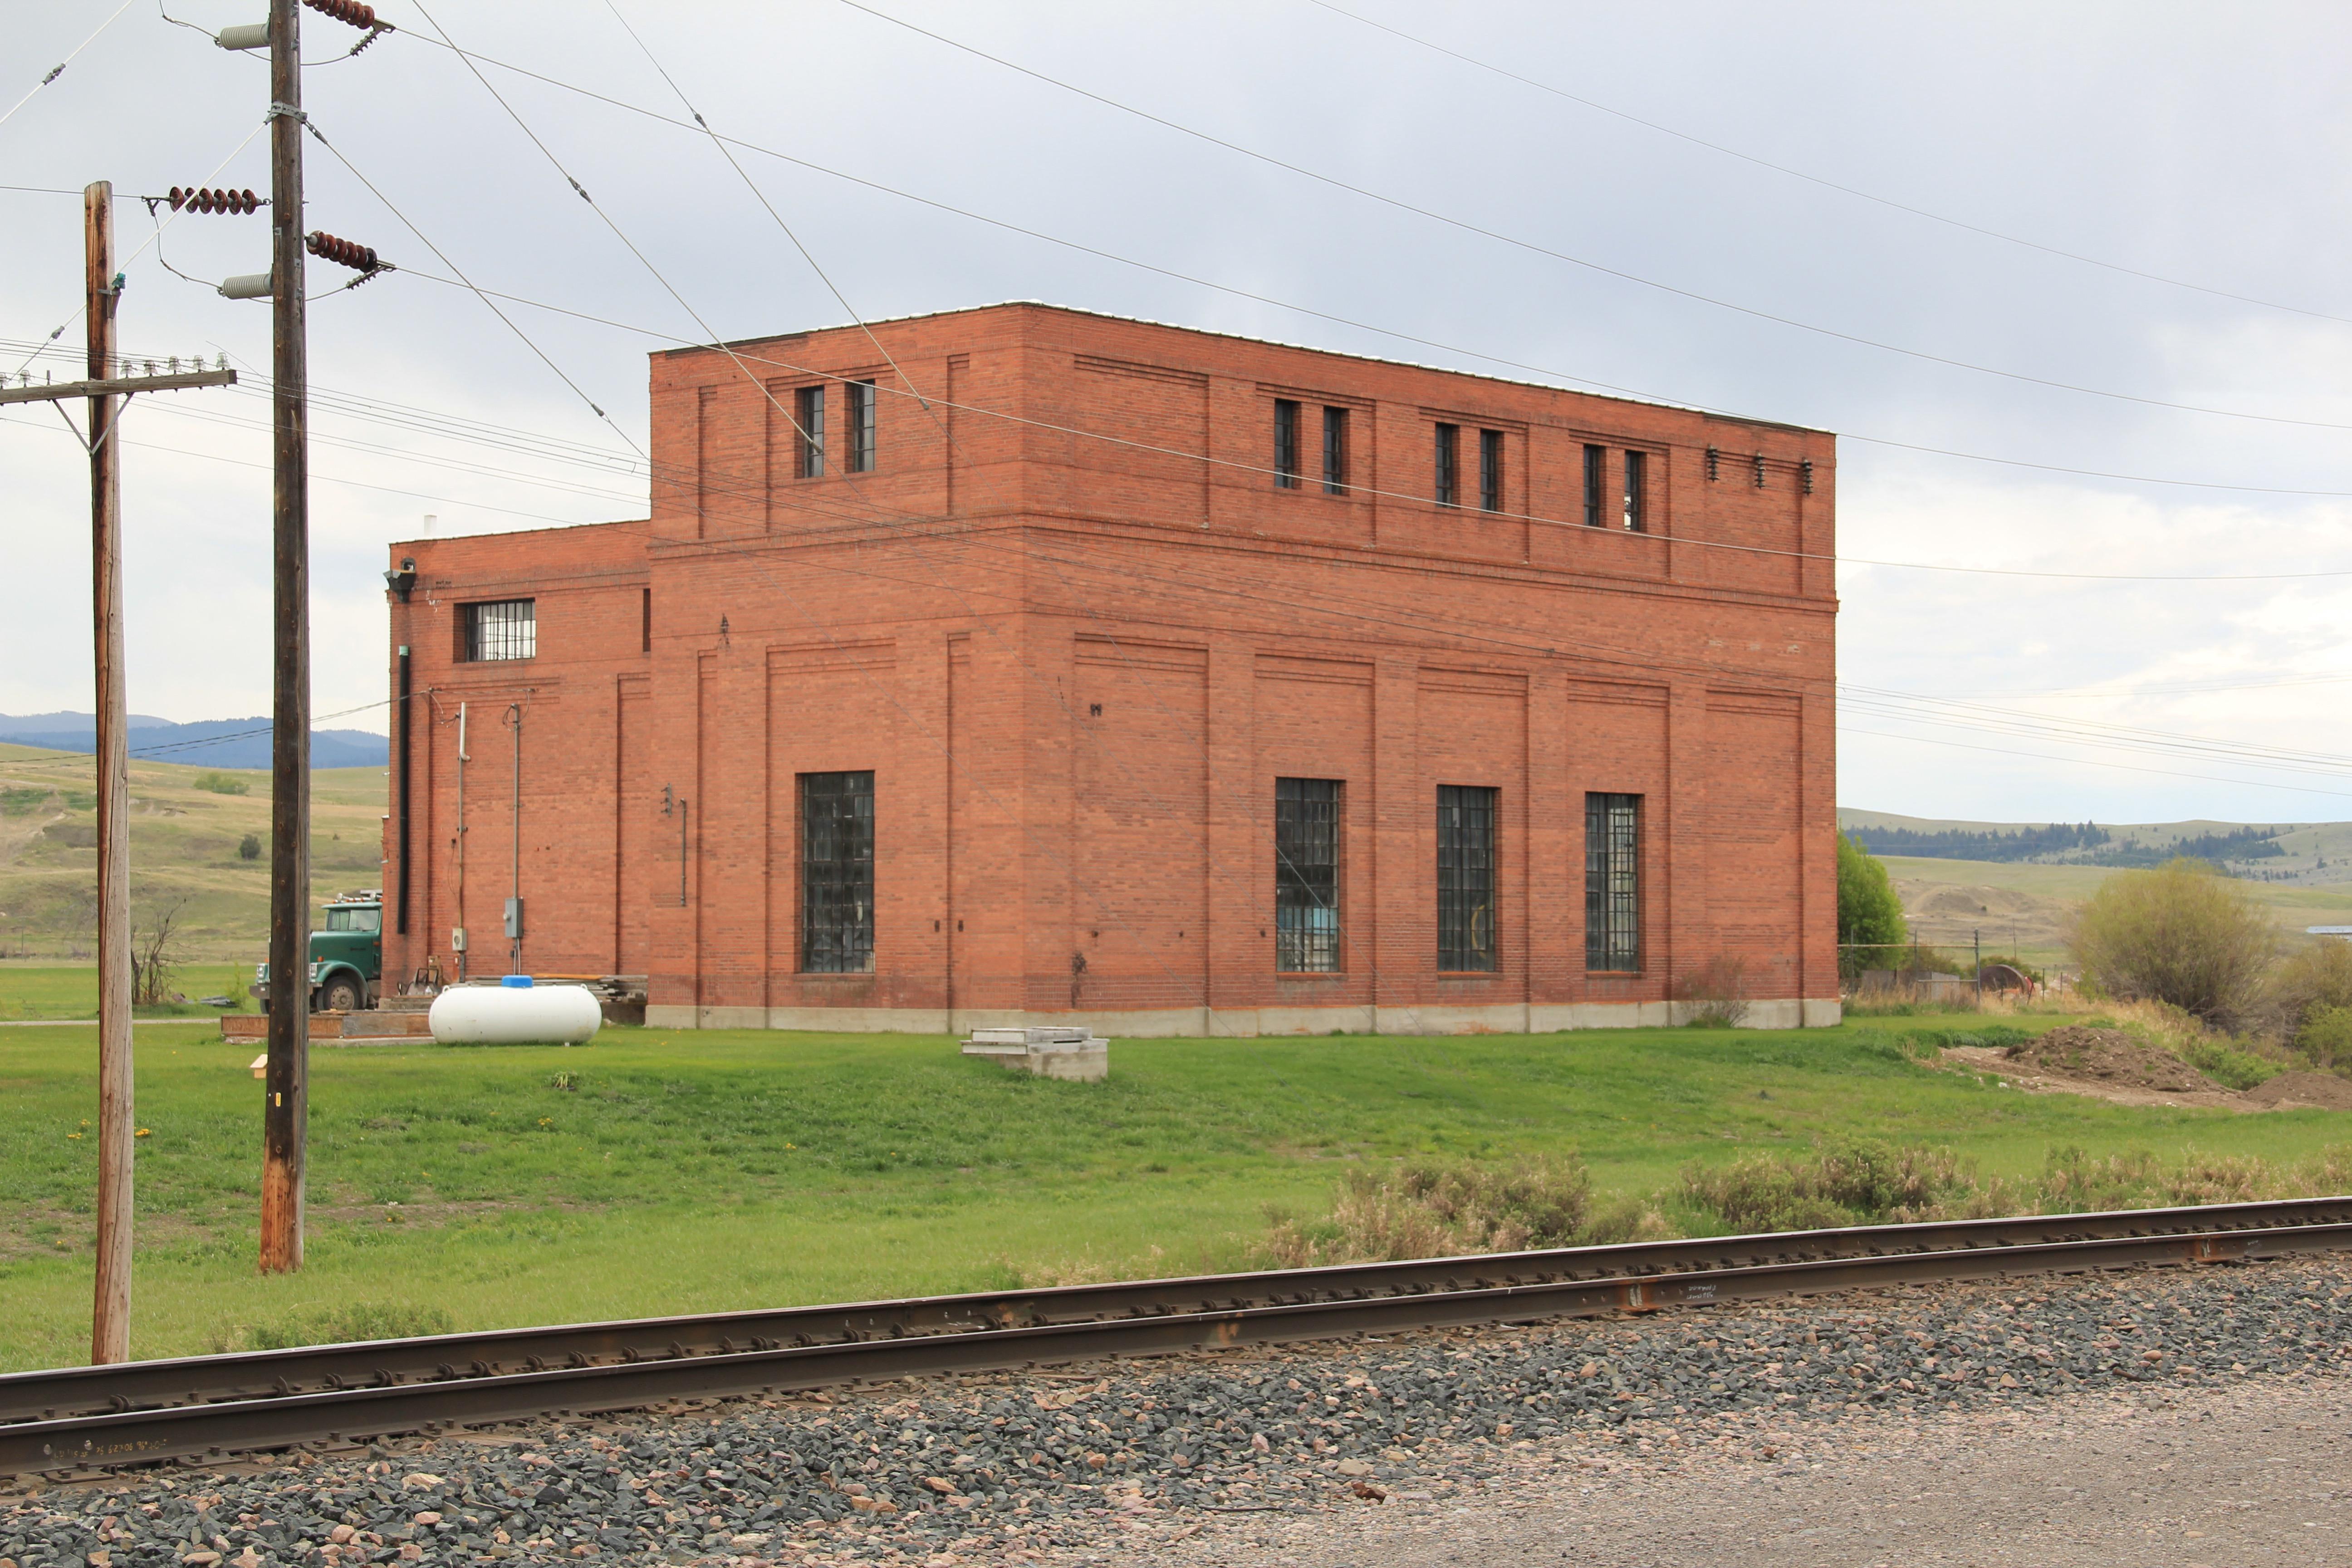 MR power plant, Gold Creek, Powell Co